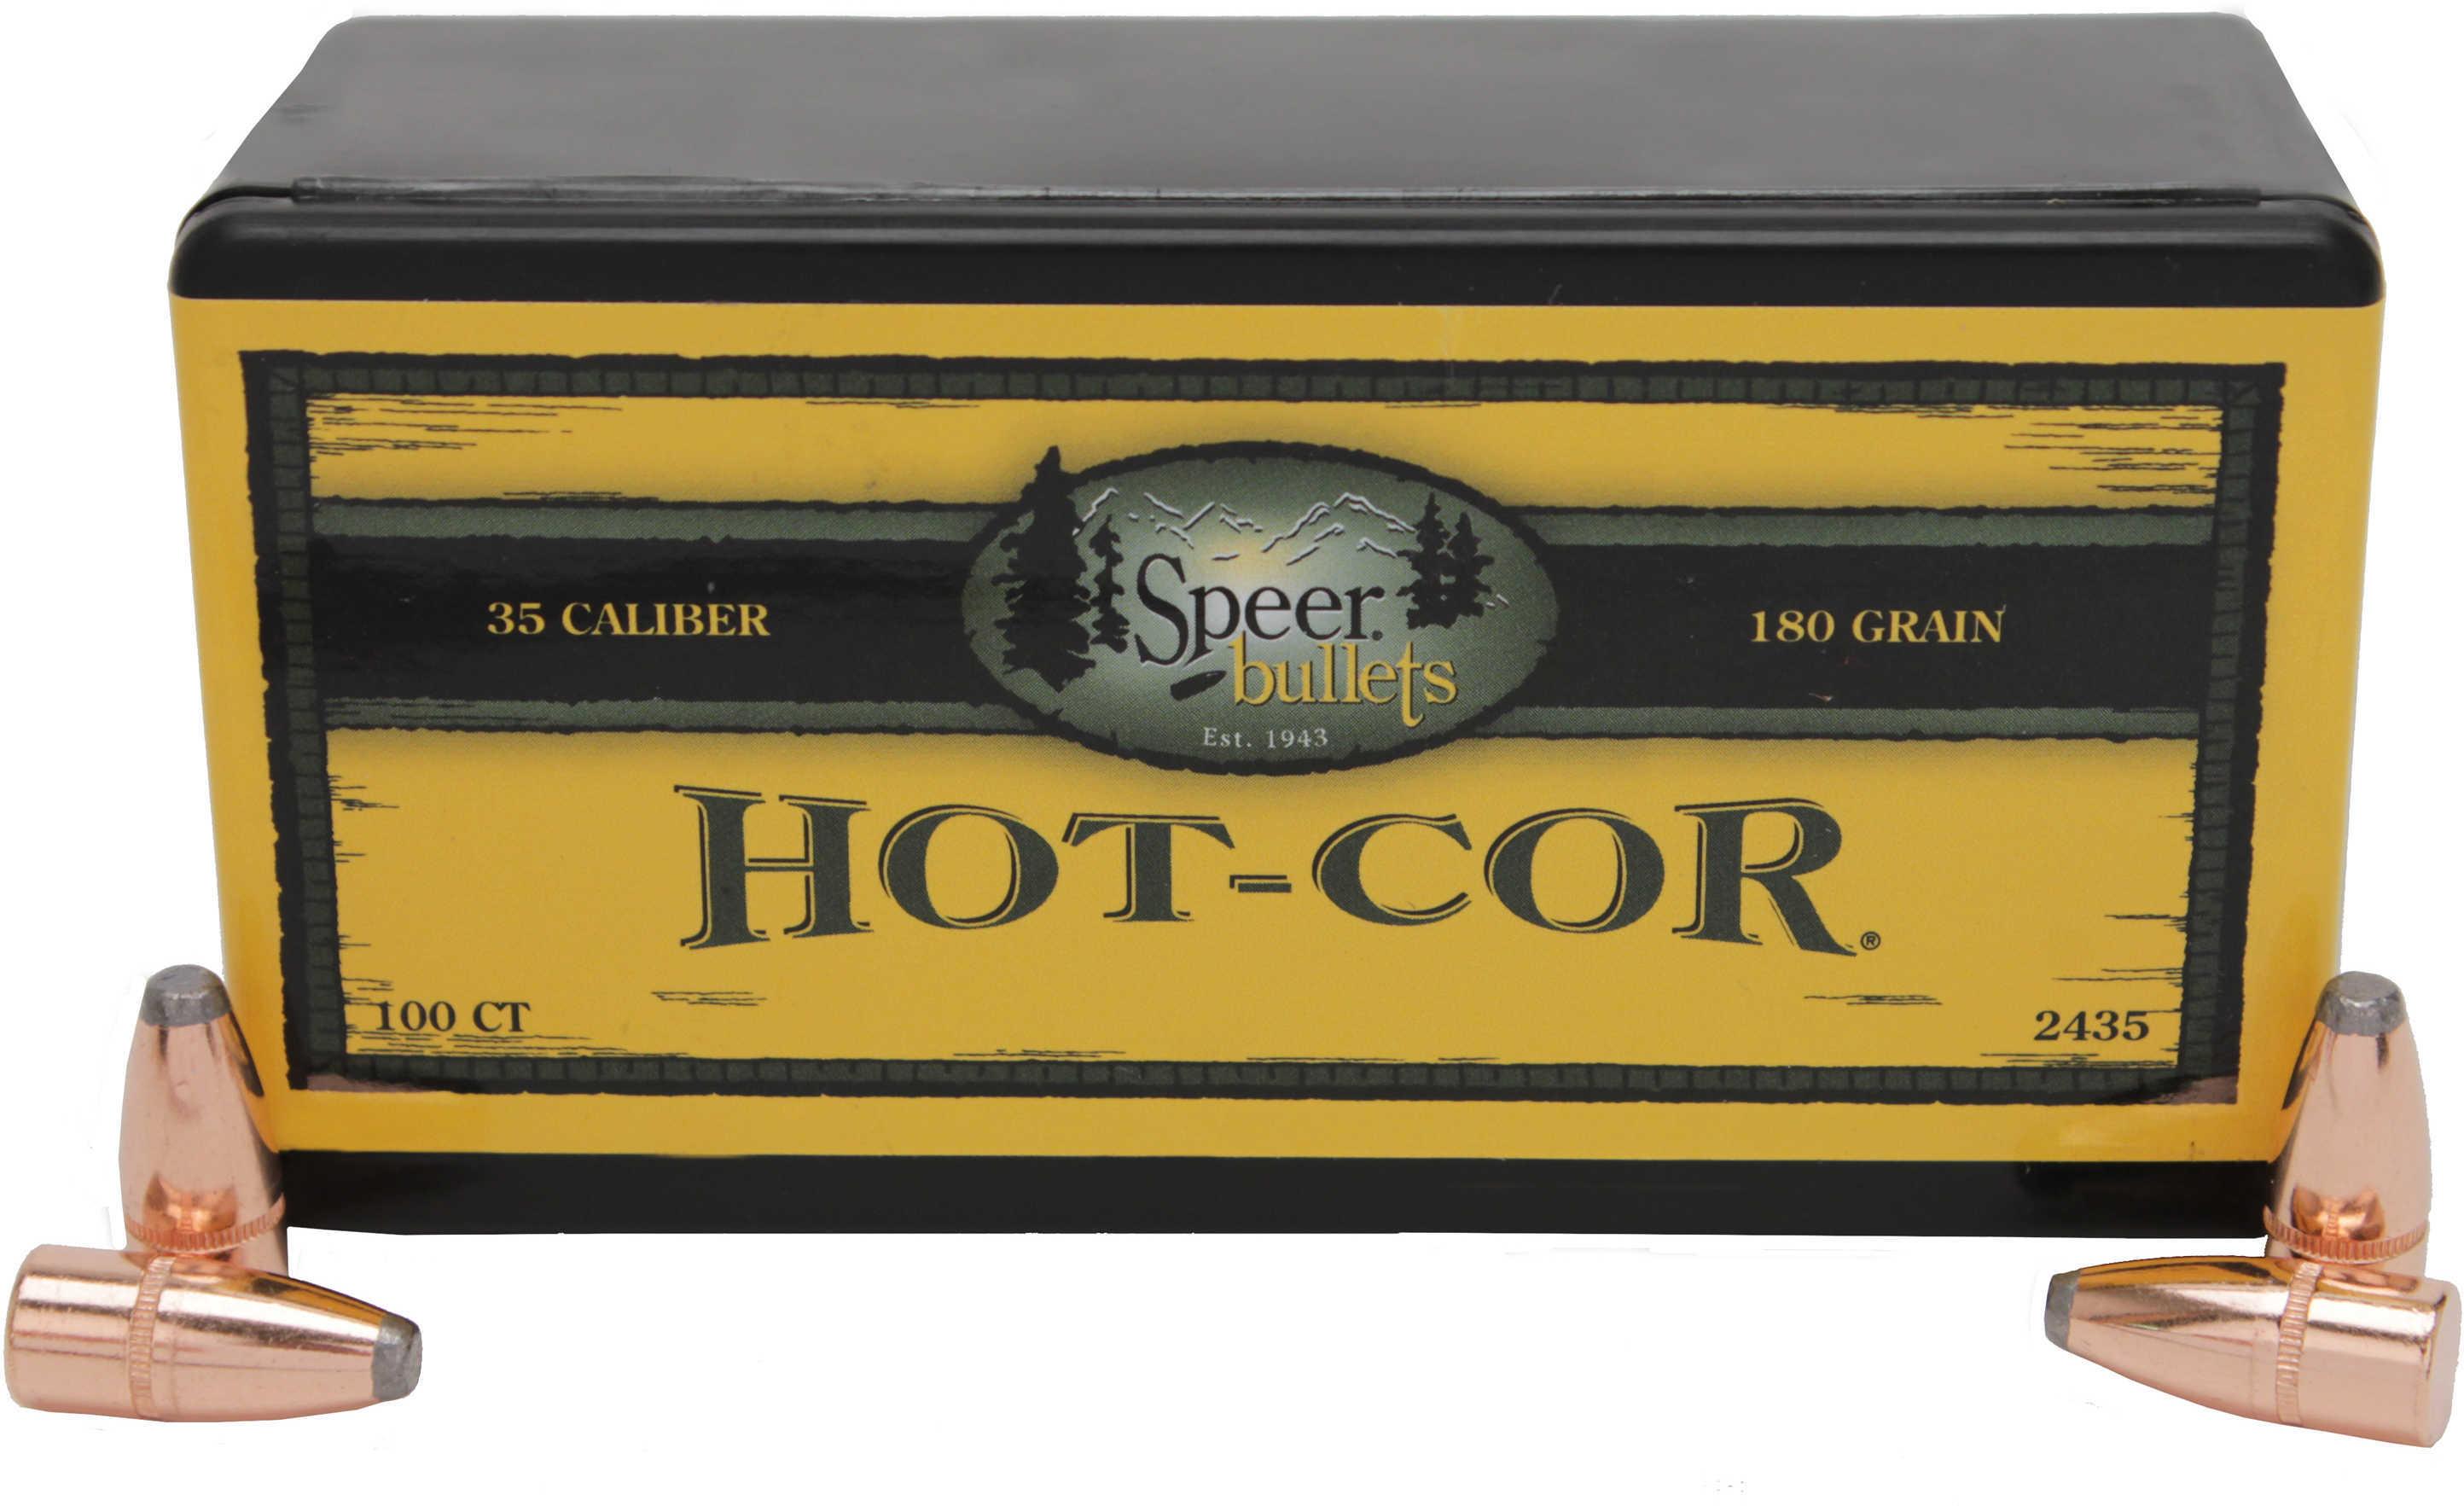 Speer 35 Caliber 180 Grains FN SP Per 100 Md: 2435 Bullets